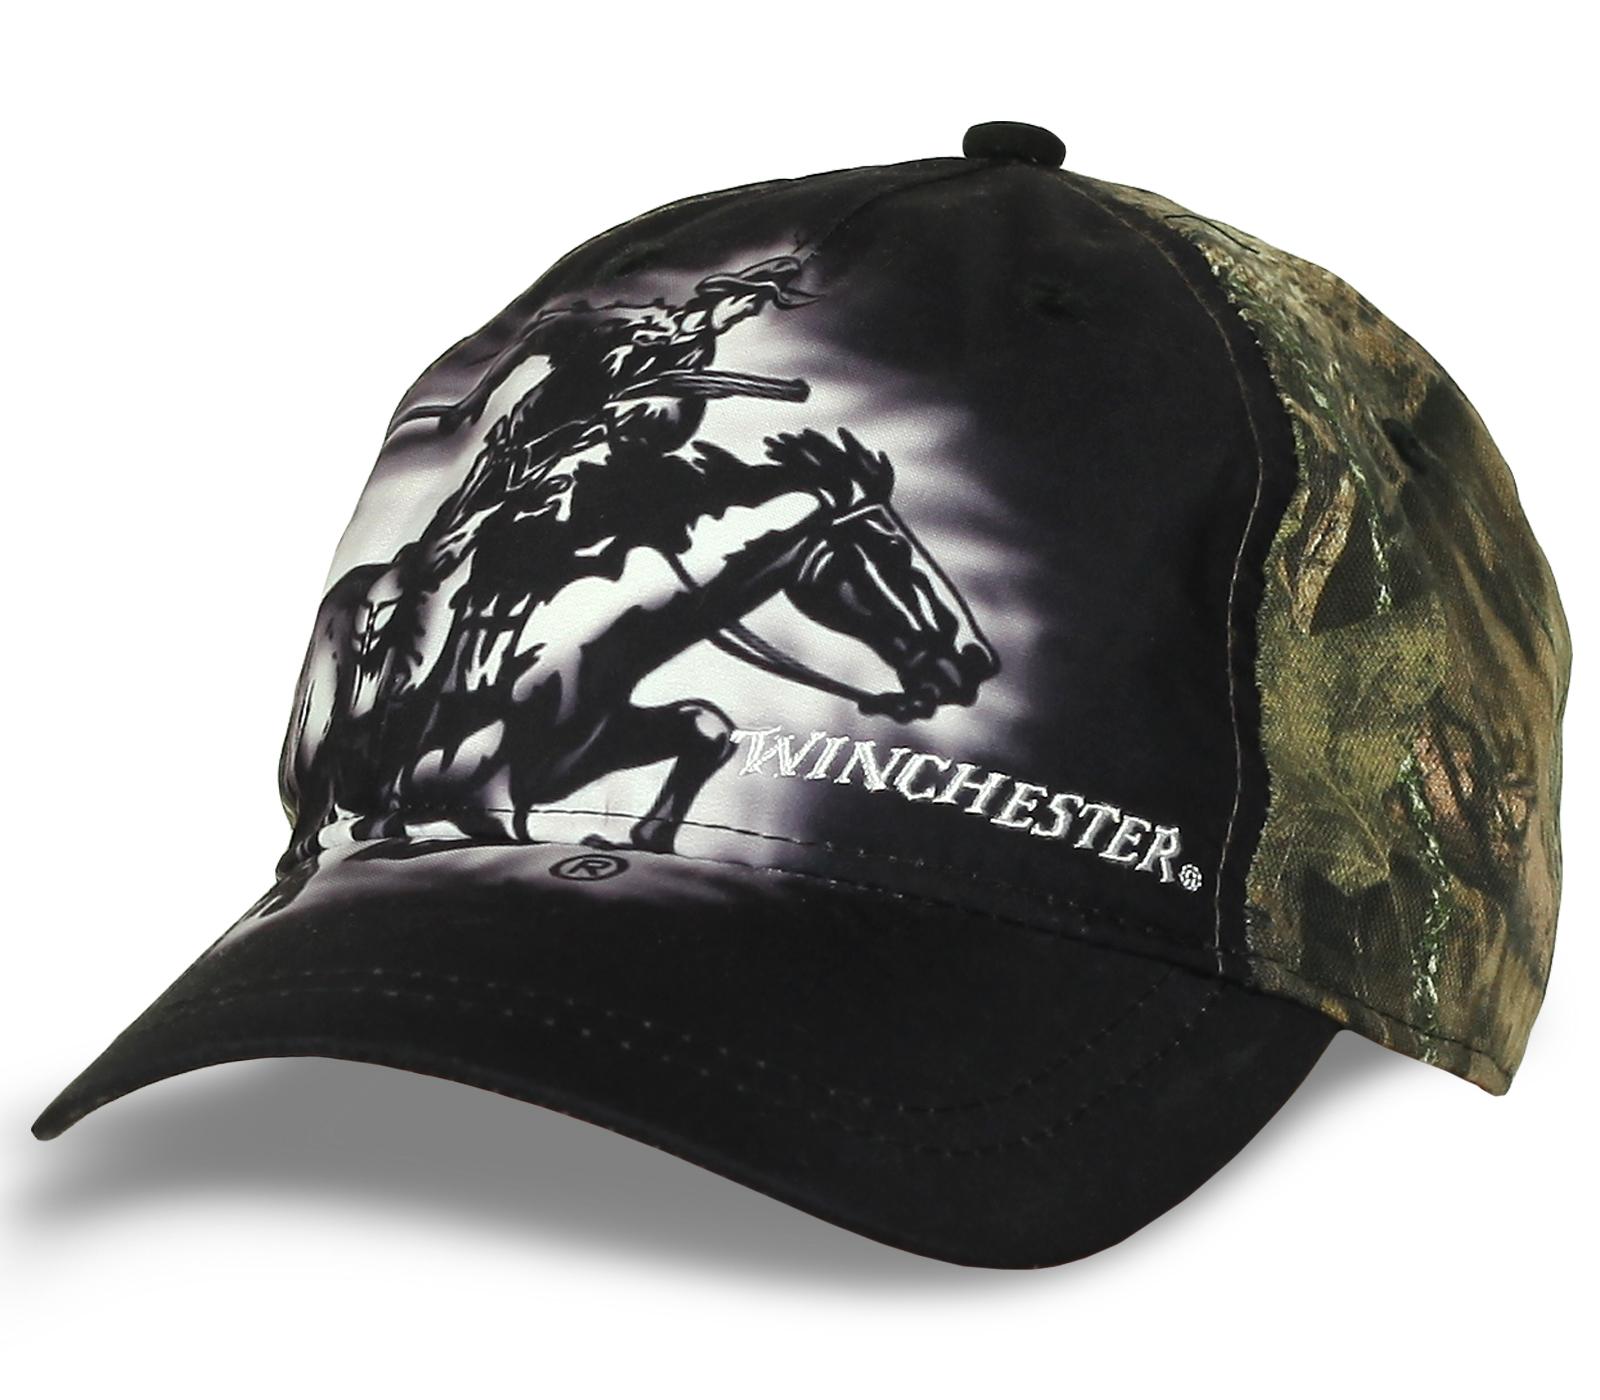 Бейсболка Winchester вышитая для охоты. Камуфляж.